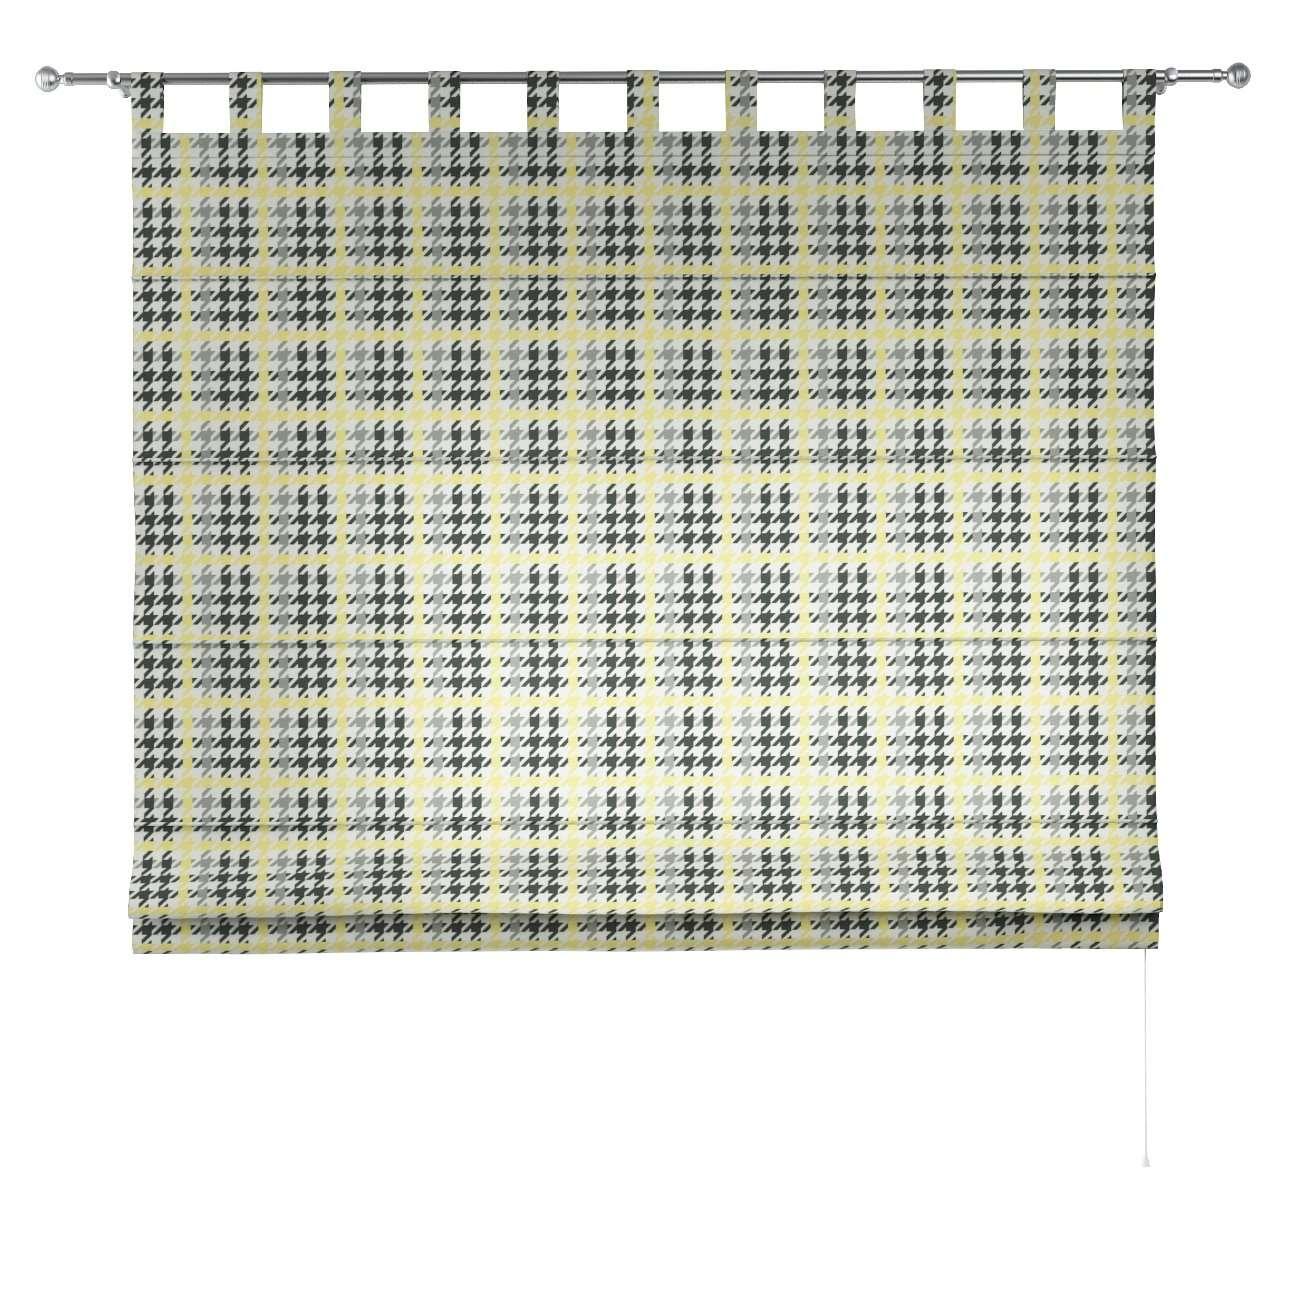 Verona tab top roman blind 80 x 170 cm (31.5 x 67 inch) in collection Brooklyn, fabric: 137-79